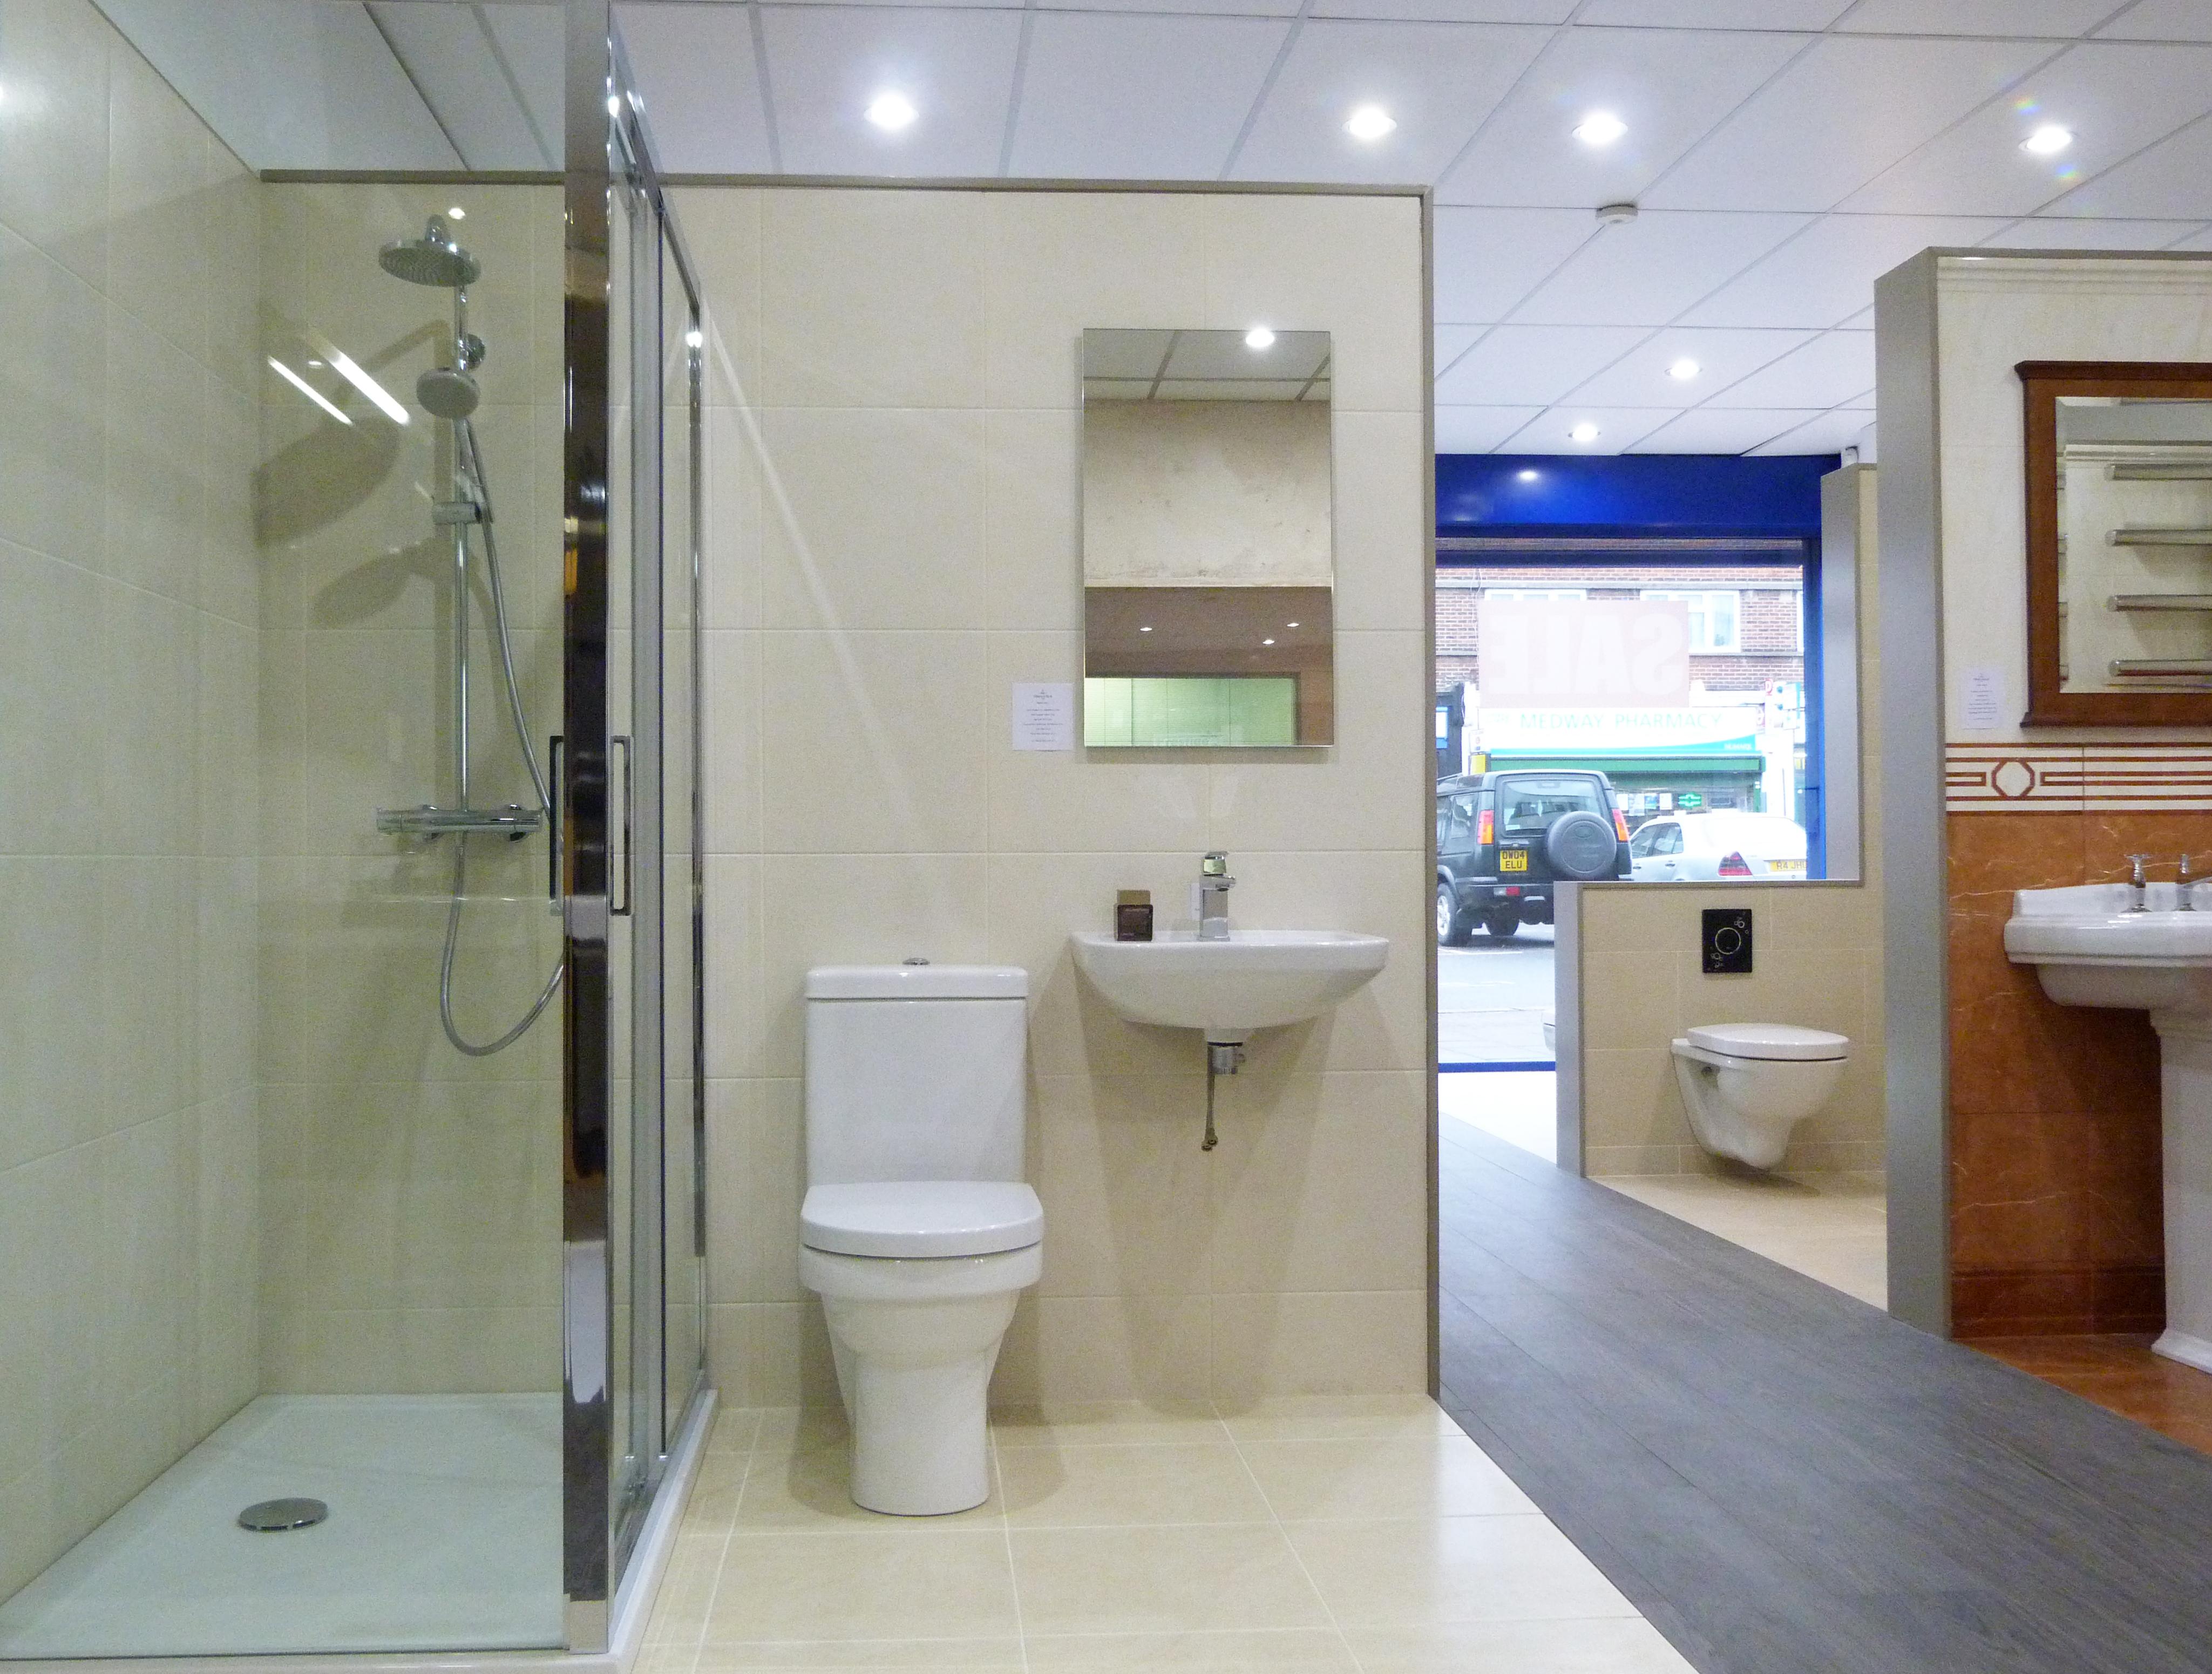 bathroom showrooms dedicated to villeroy & boch showroom CNBSHVN